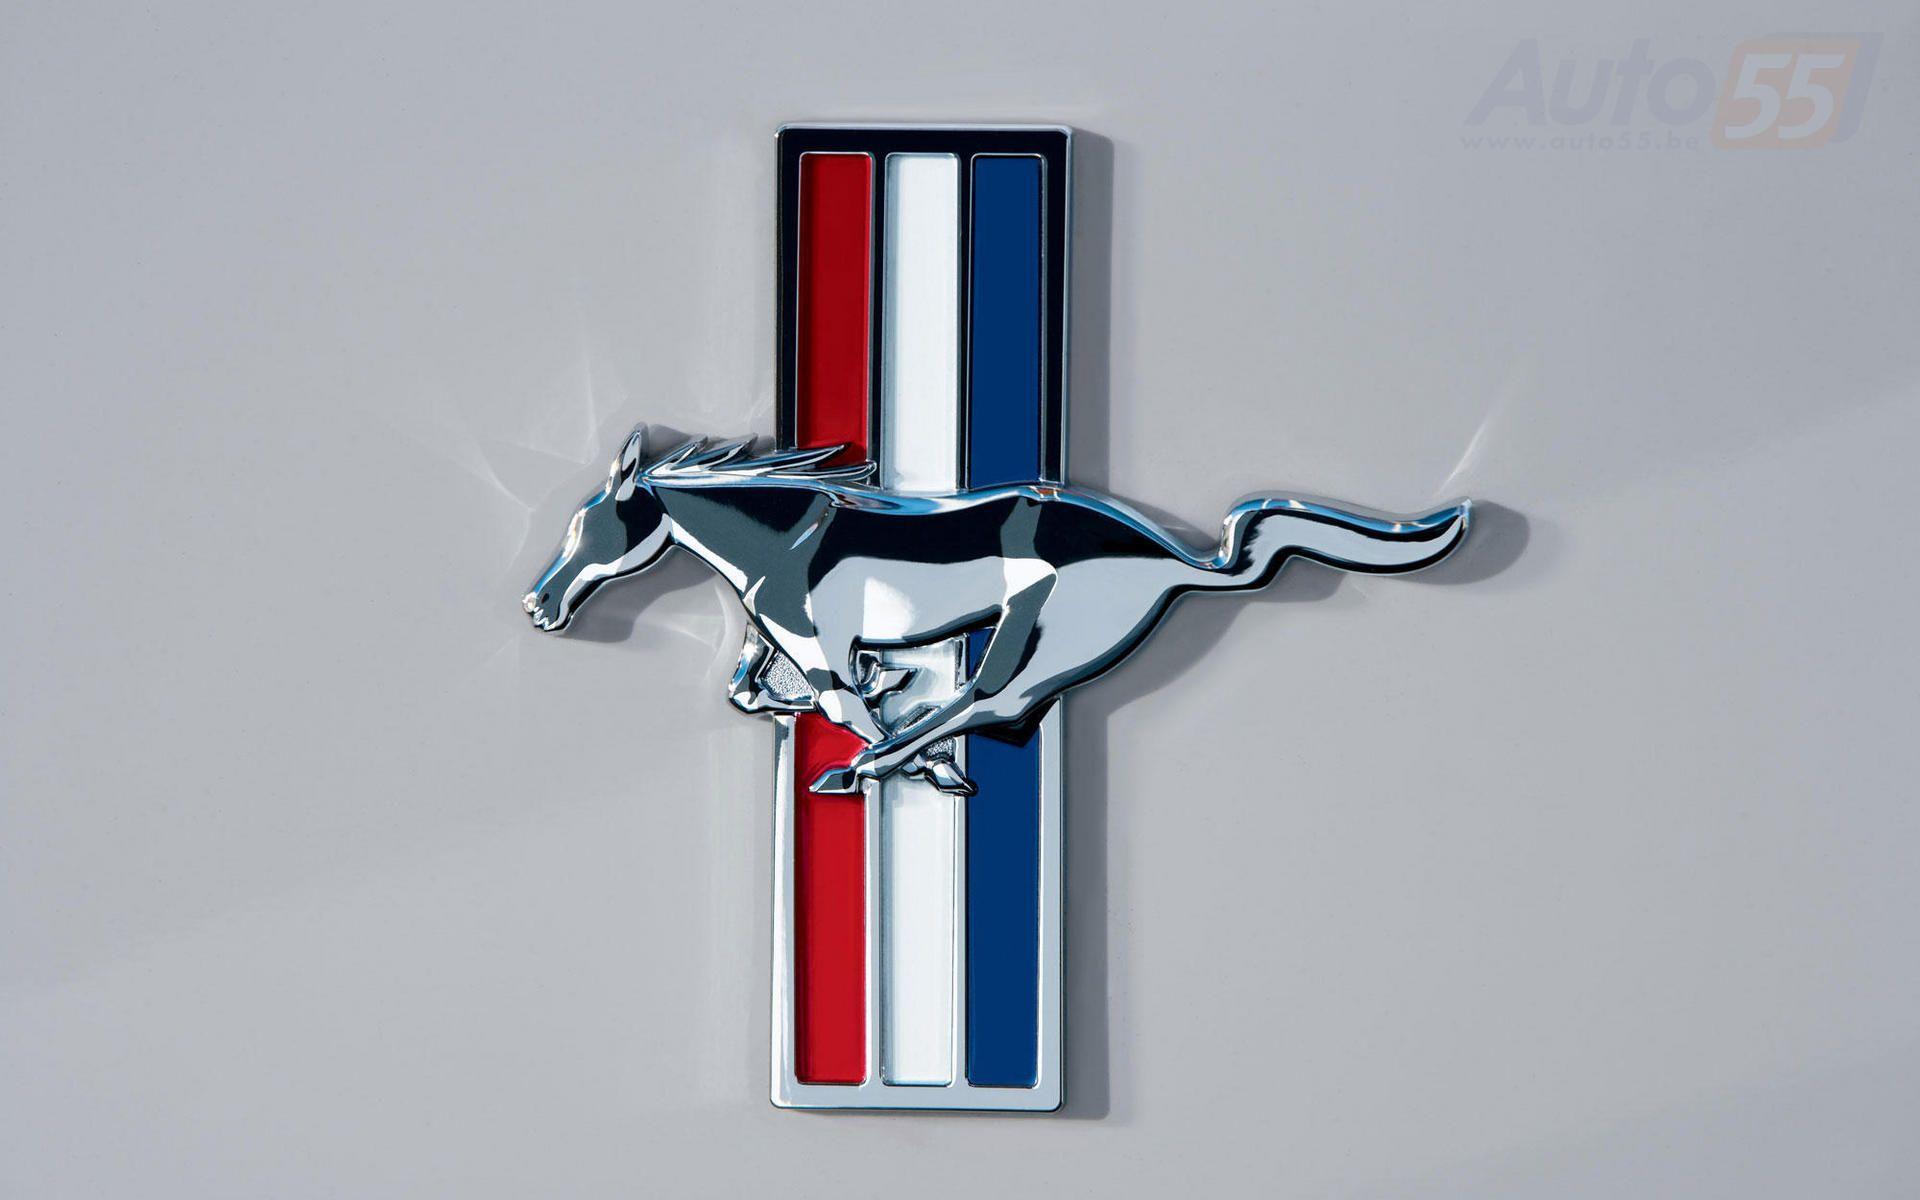 Good Wallpaper Logo Ford Mustang - aU245xI  Image_48316.jpg